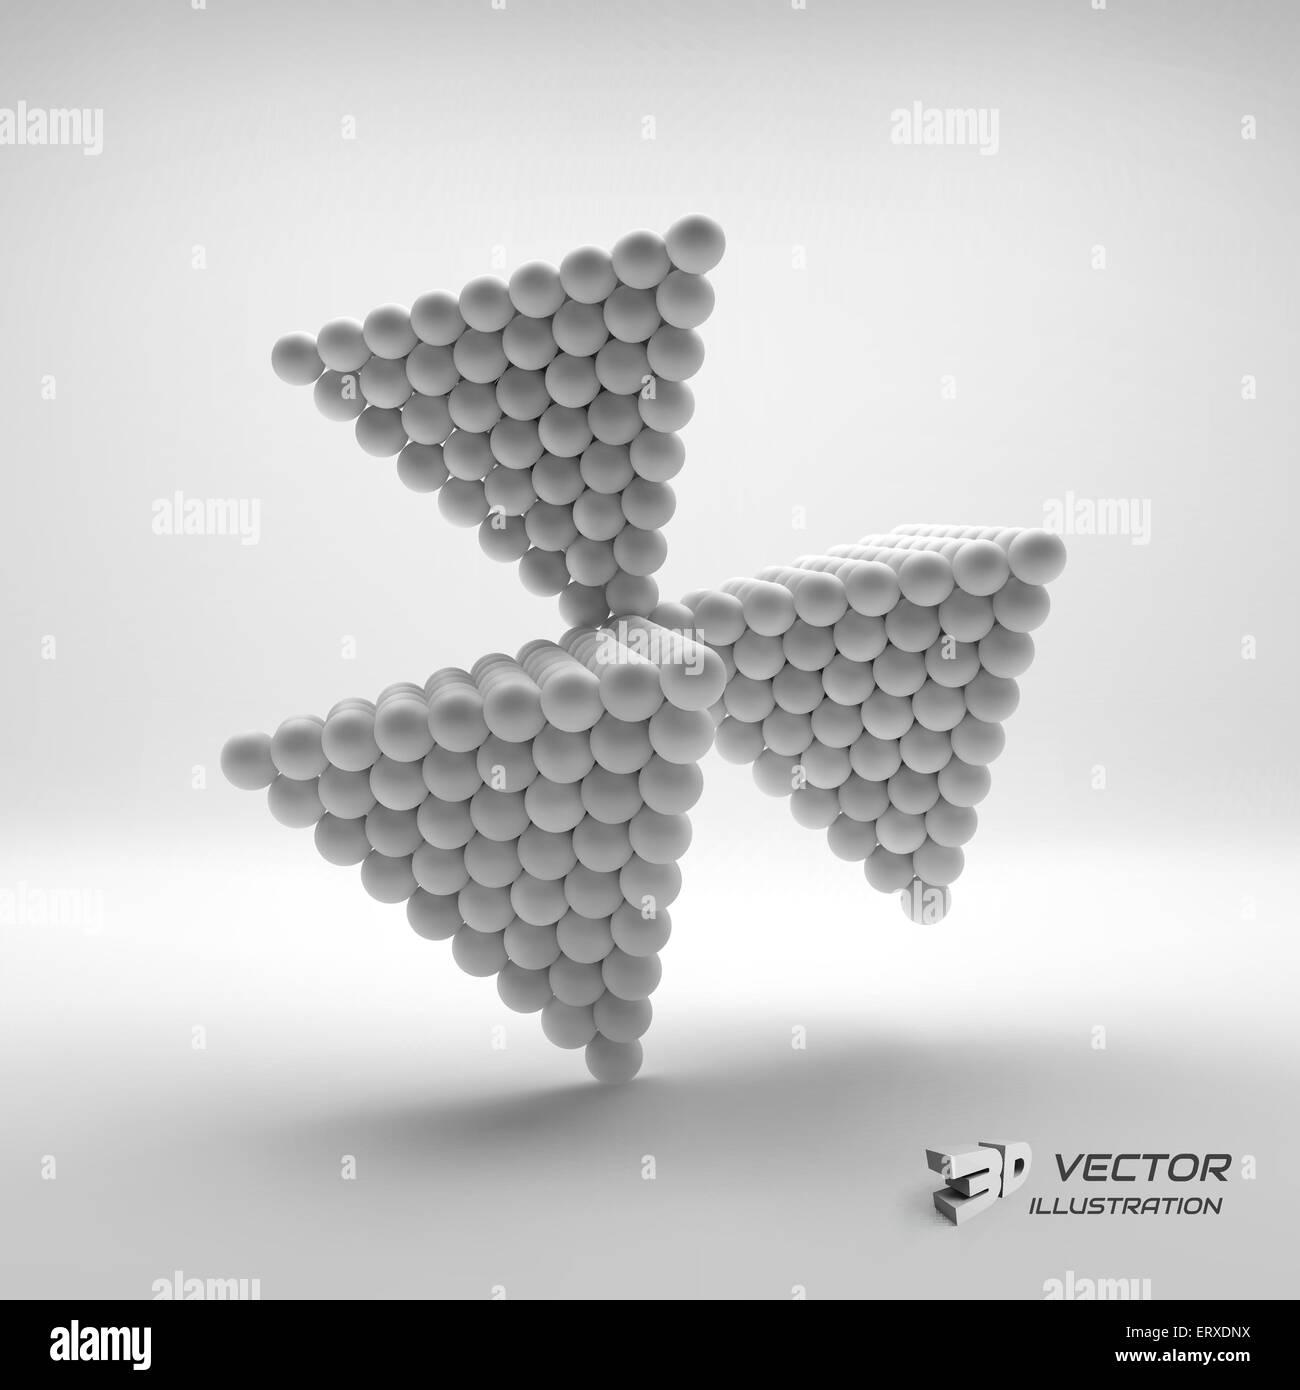 Pyramidal Stock Vector Images - Alamy